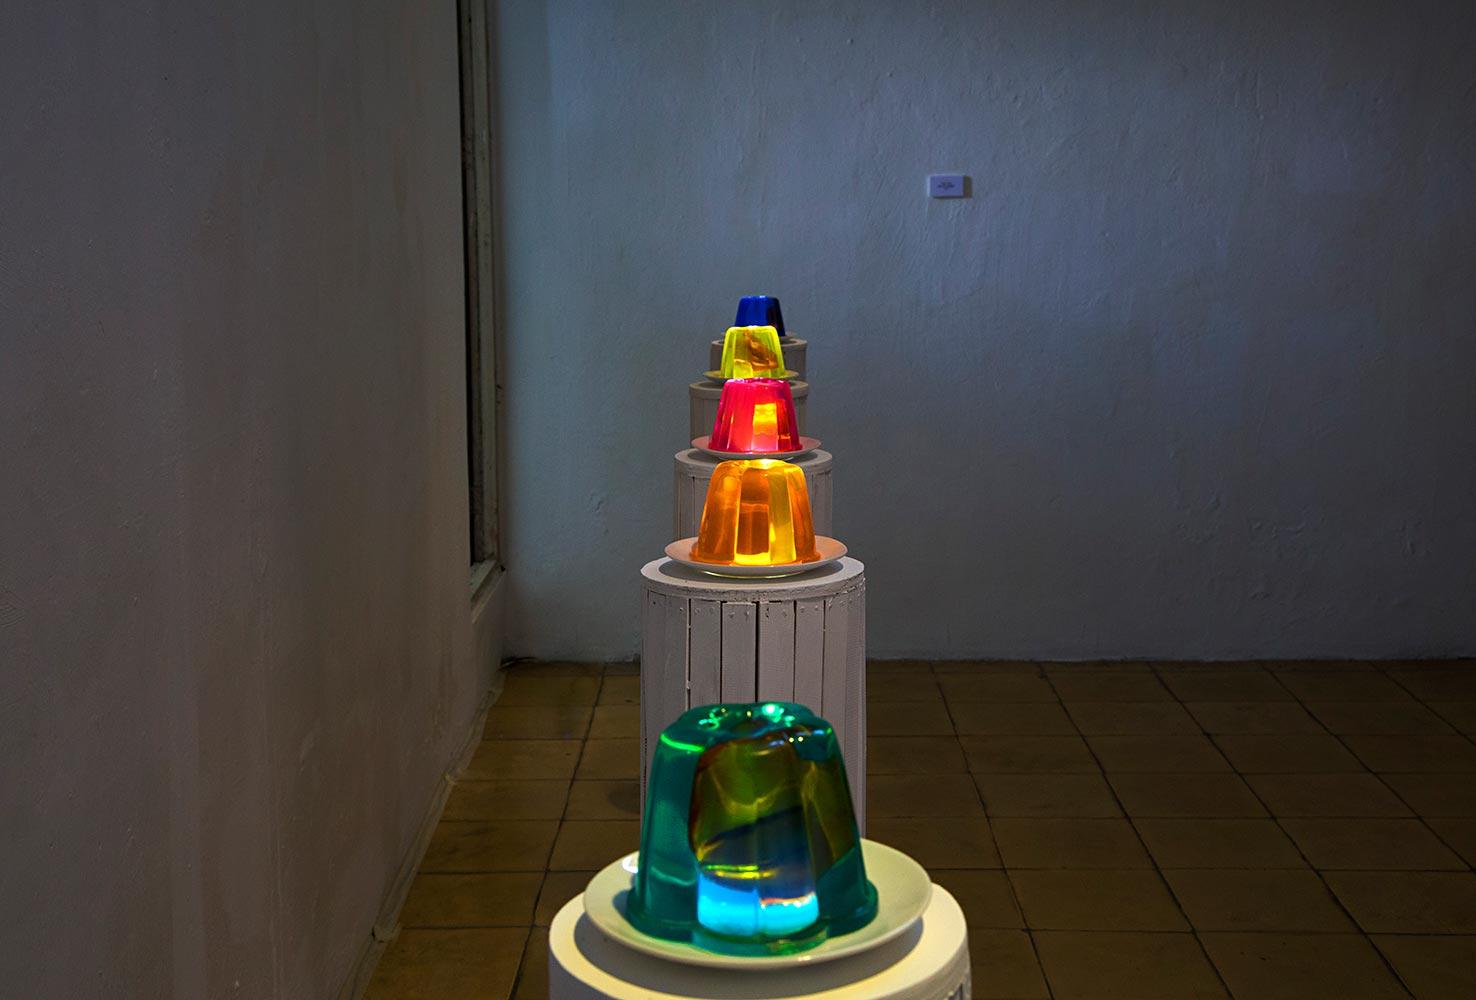 BUT IT'S ALRIGHT :  Resin Work, 39 cm (height) x 20 cm (diameter), light works, 5 pieces. Cemeti Art House, Yogyakarta - Indonesia